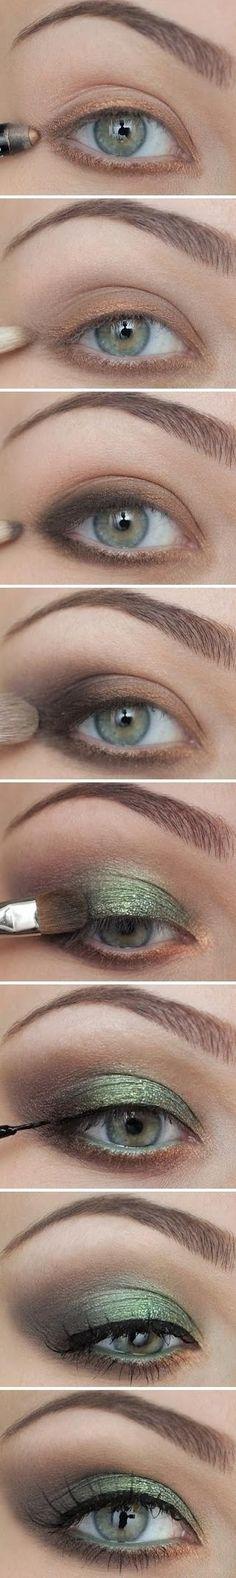 Makeup Tutorial: Green & Cooper Smokey EyeNaturally Glam™ | Naturally Glam™